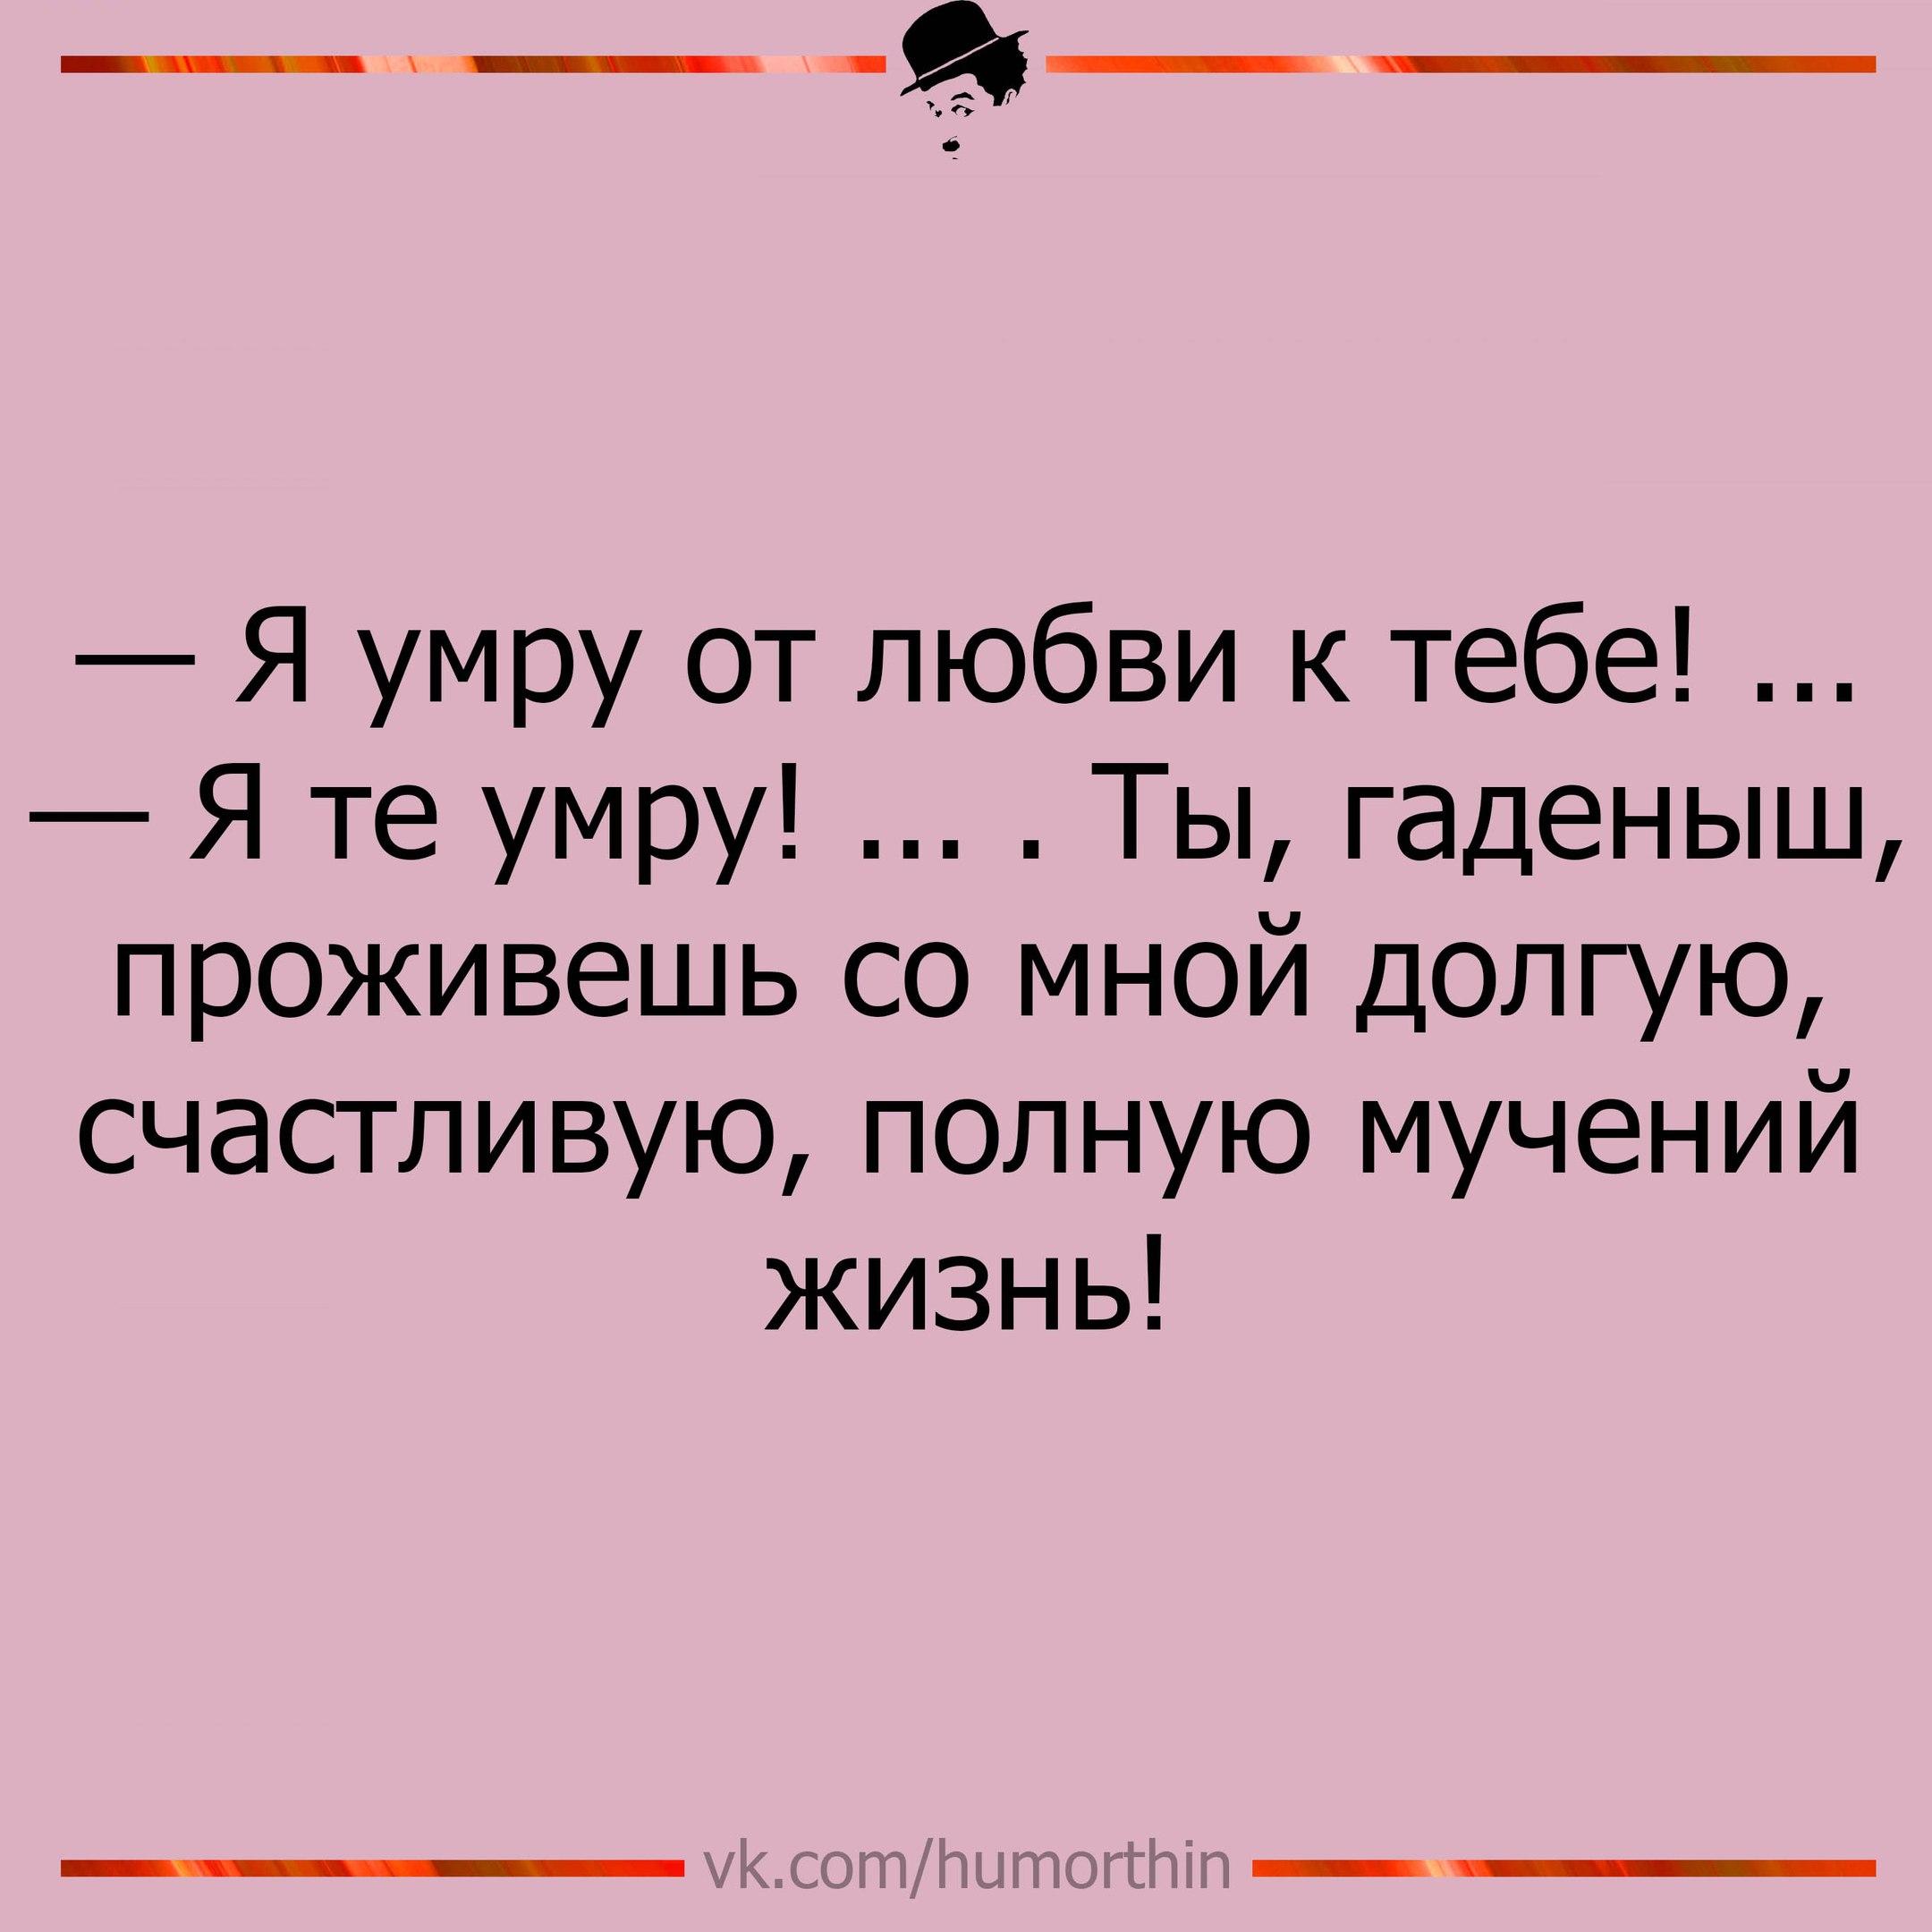 https://pp.userapi.com/c543104/v543104677/40913/dBuoToNo0XE.jpg